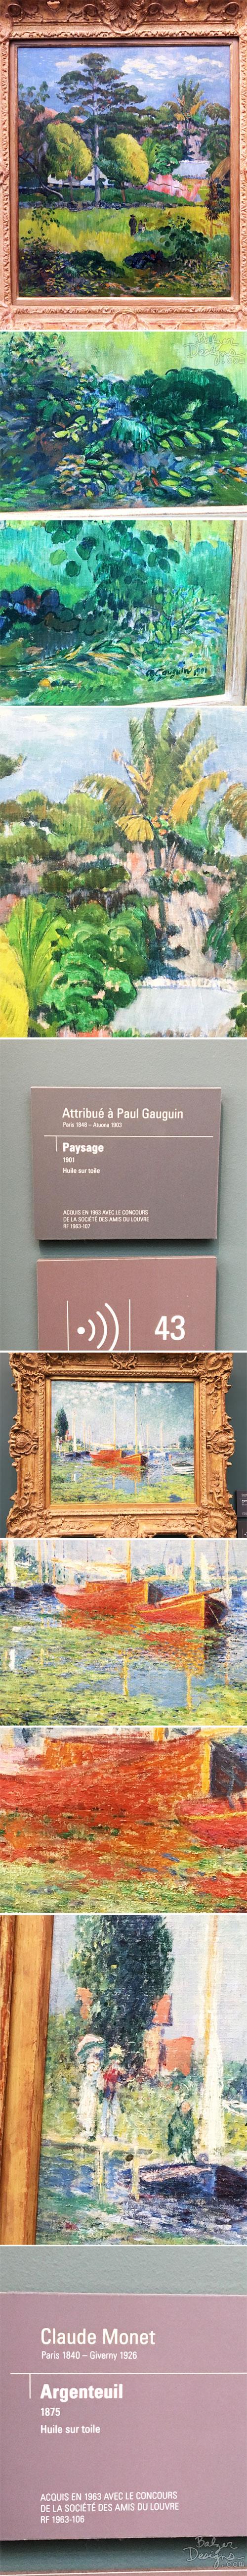 From the Balzer Designs Blog: Musee de L'Orangerie